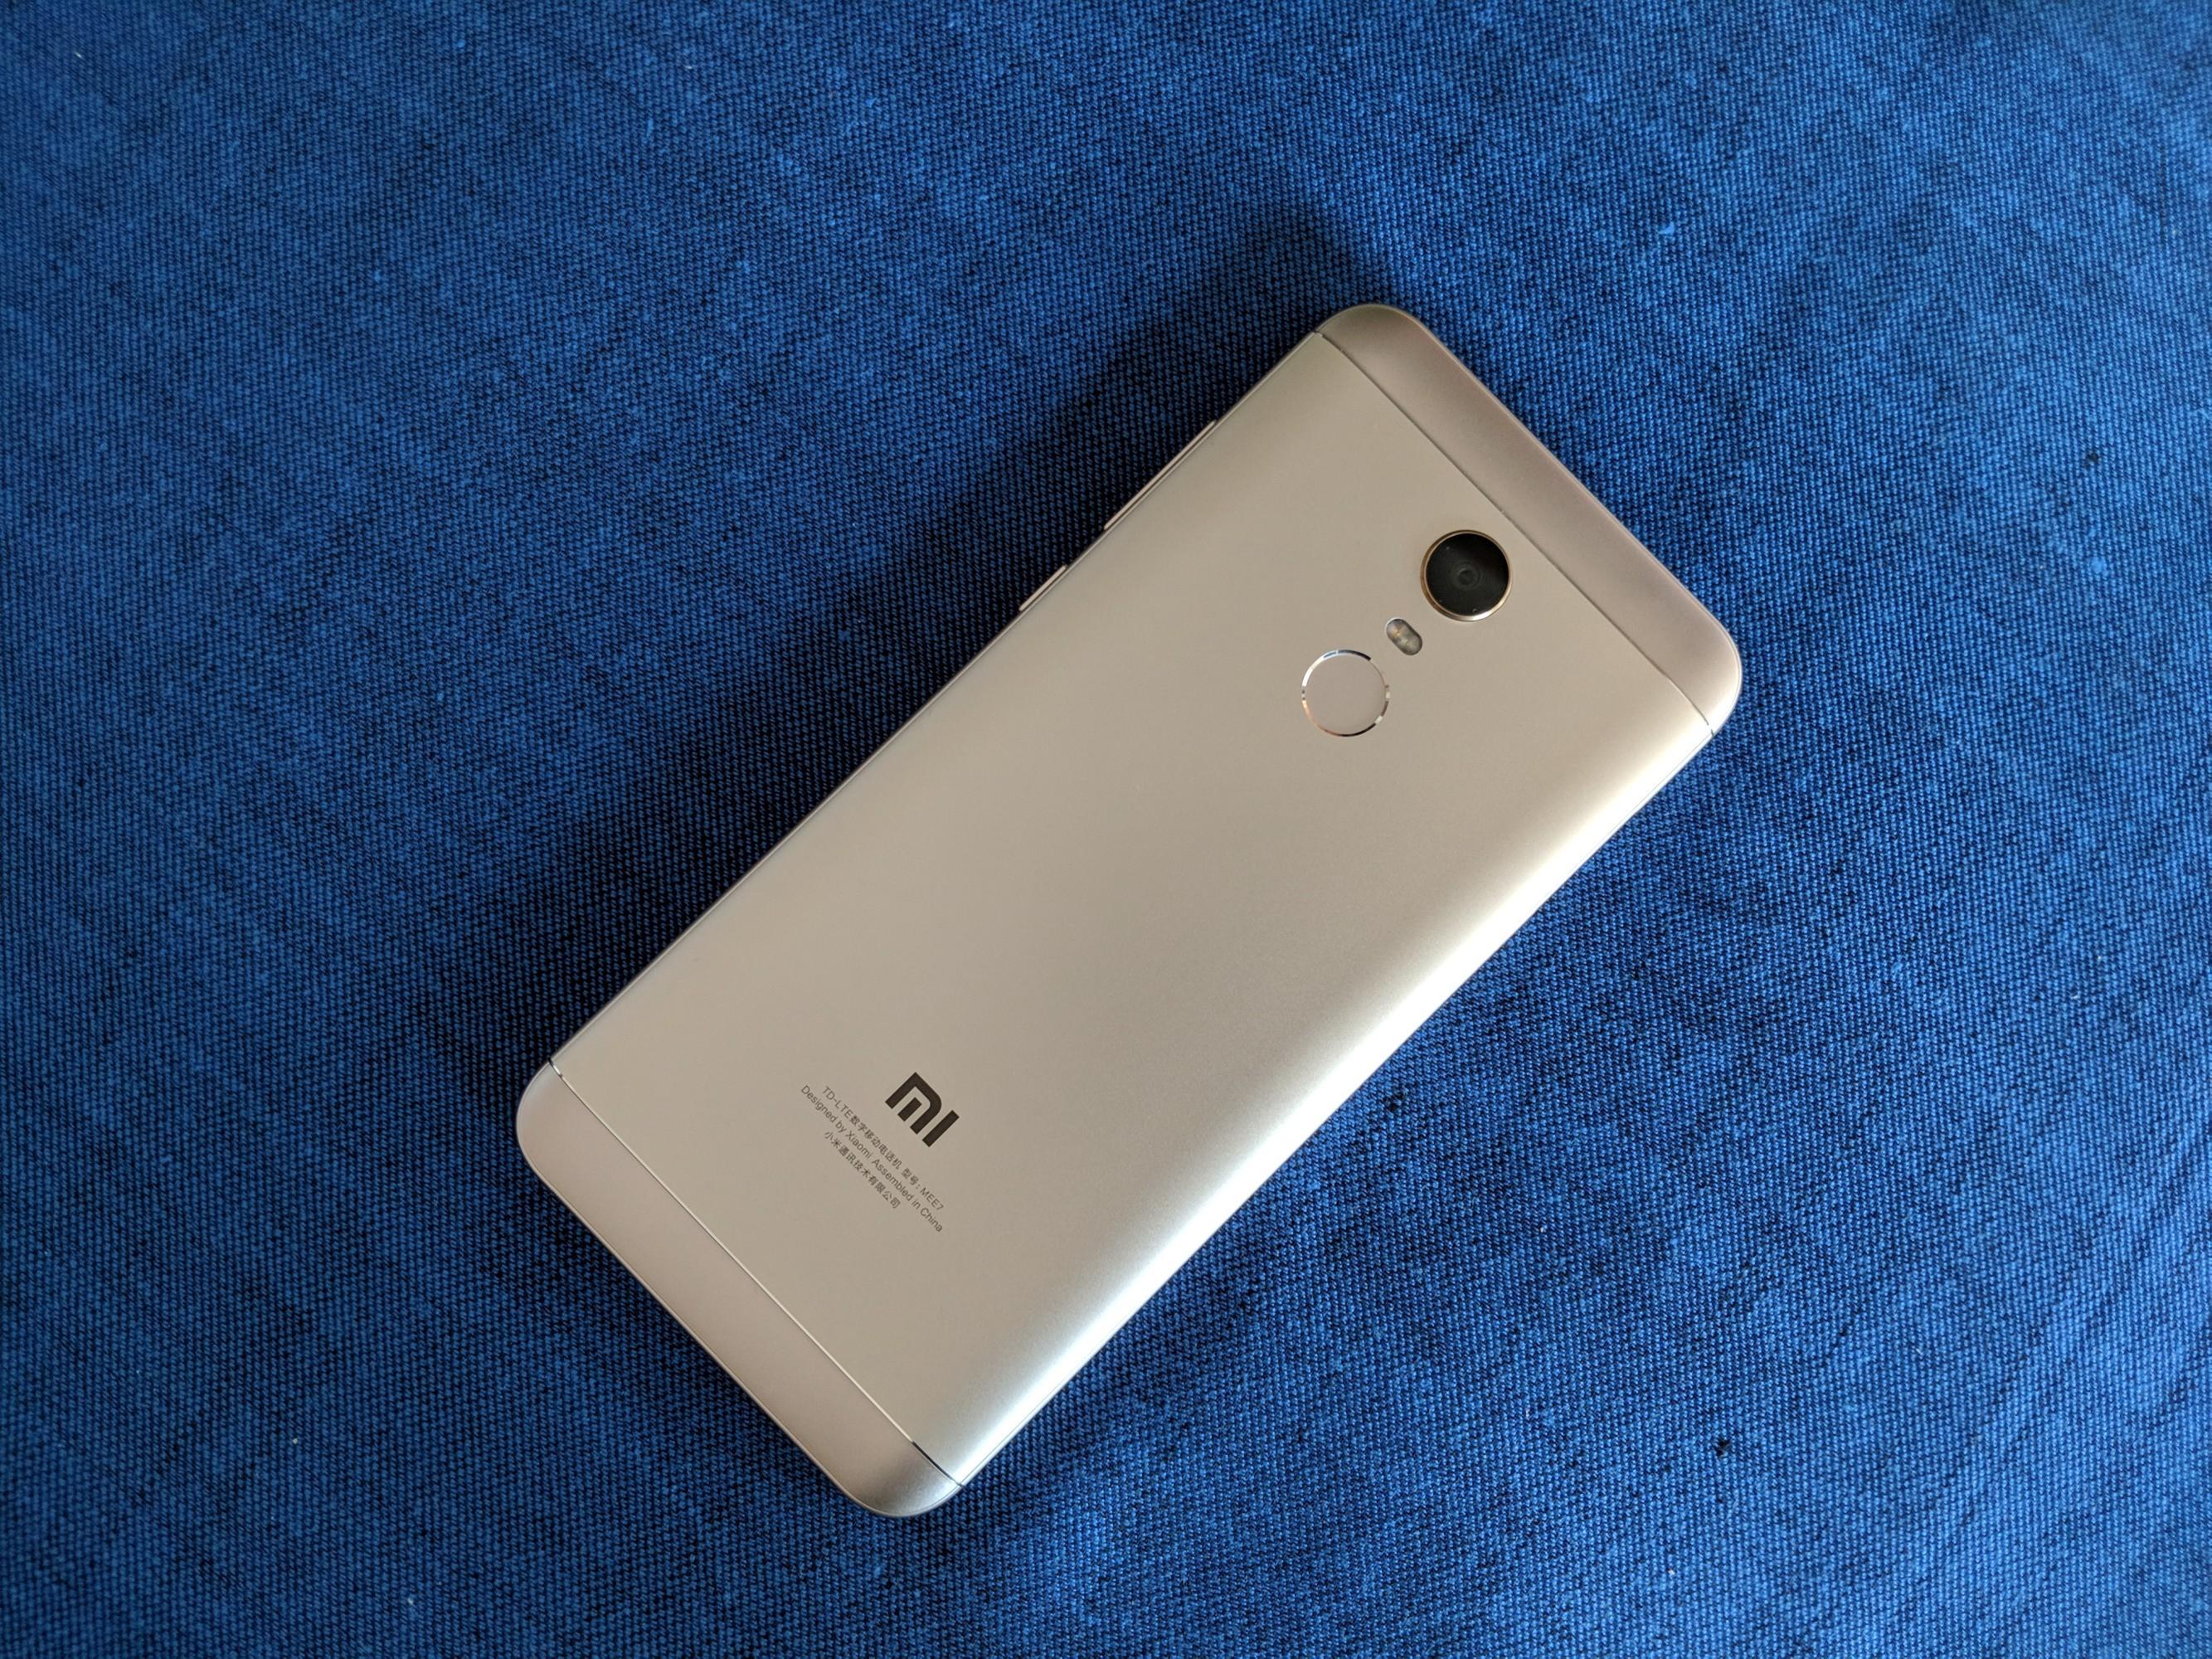 Xiaomi-Redmi-5-Plus-7